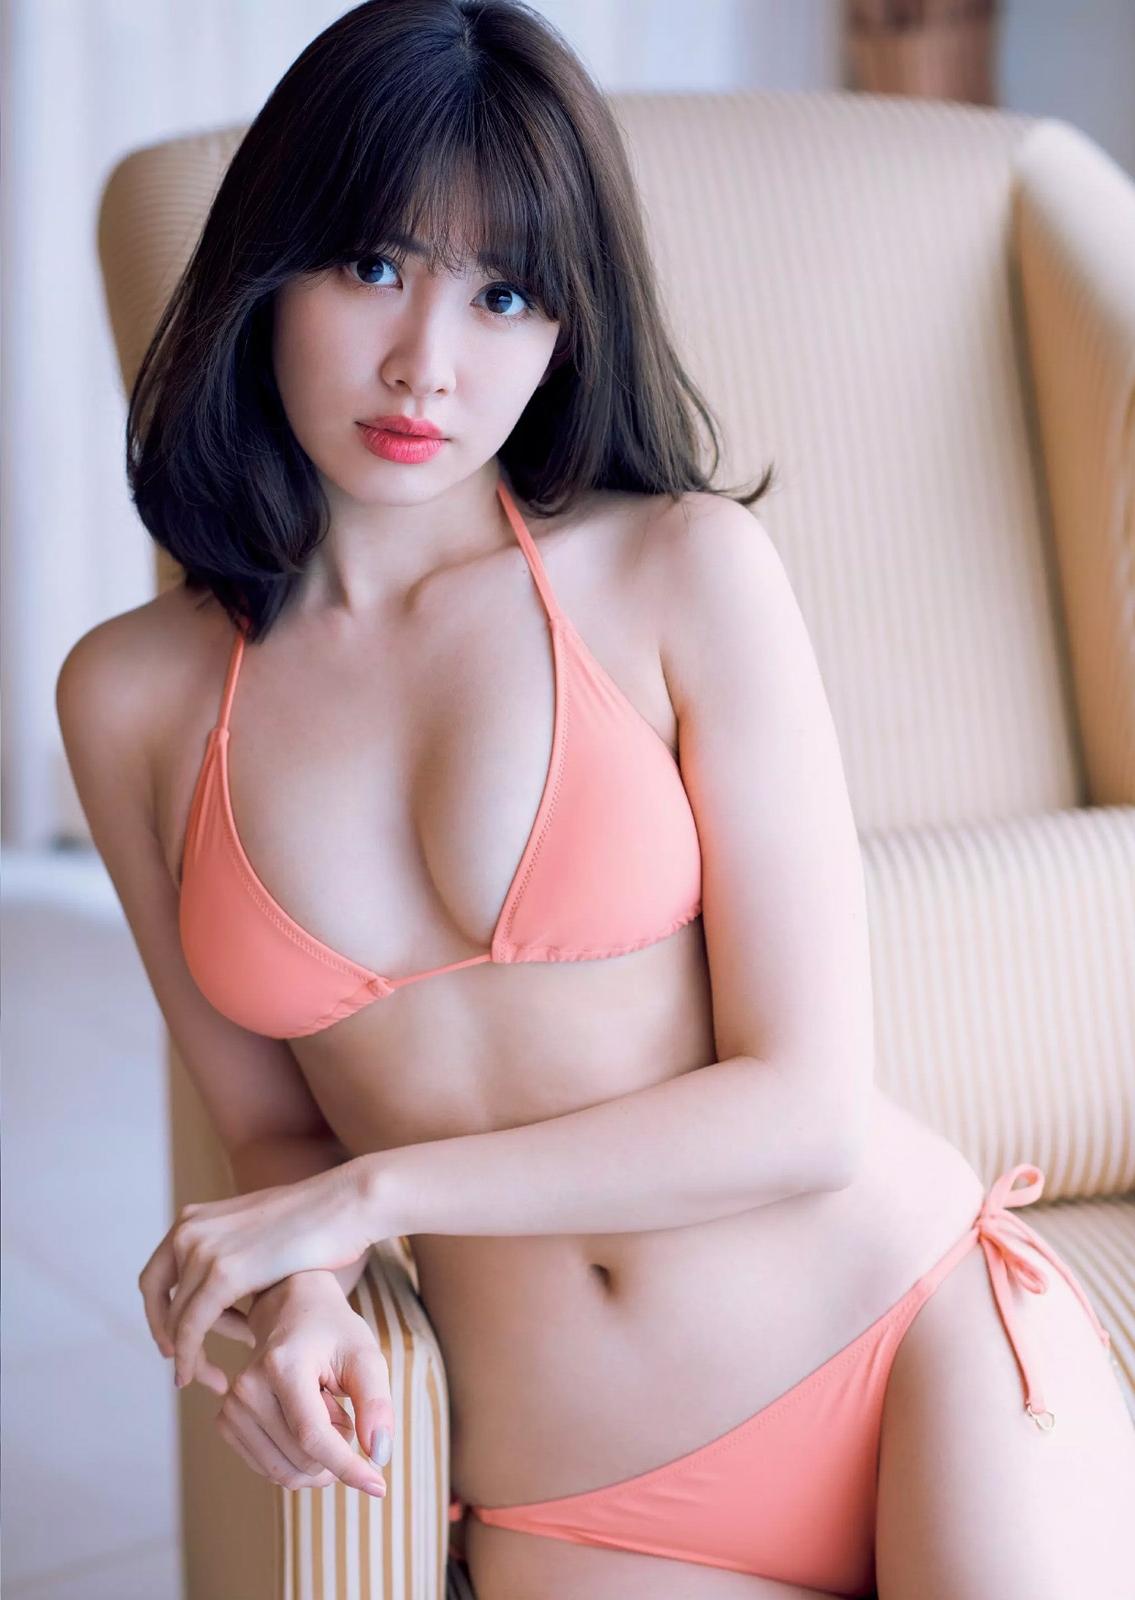 image http://scanlover.com/assets/images/7847-E0nhwoReHA7H2aJY.jpeg